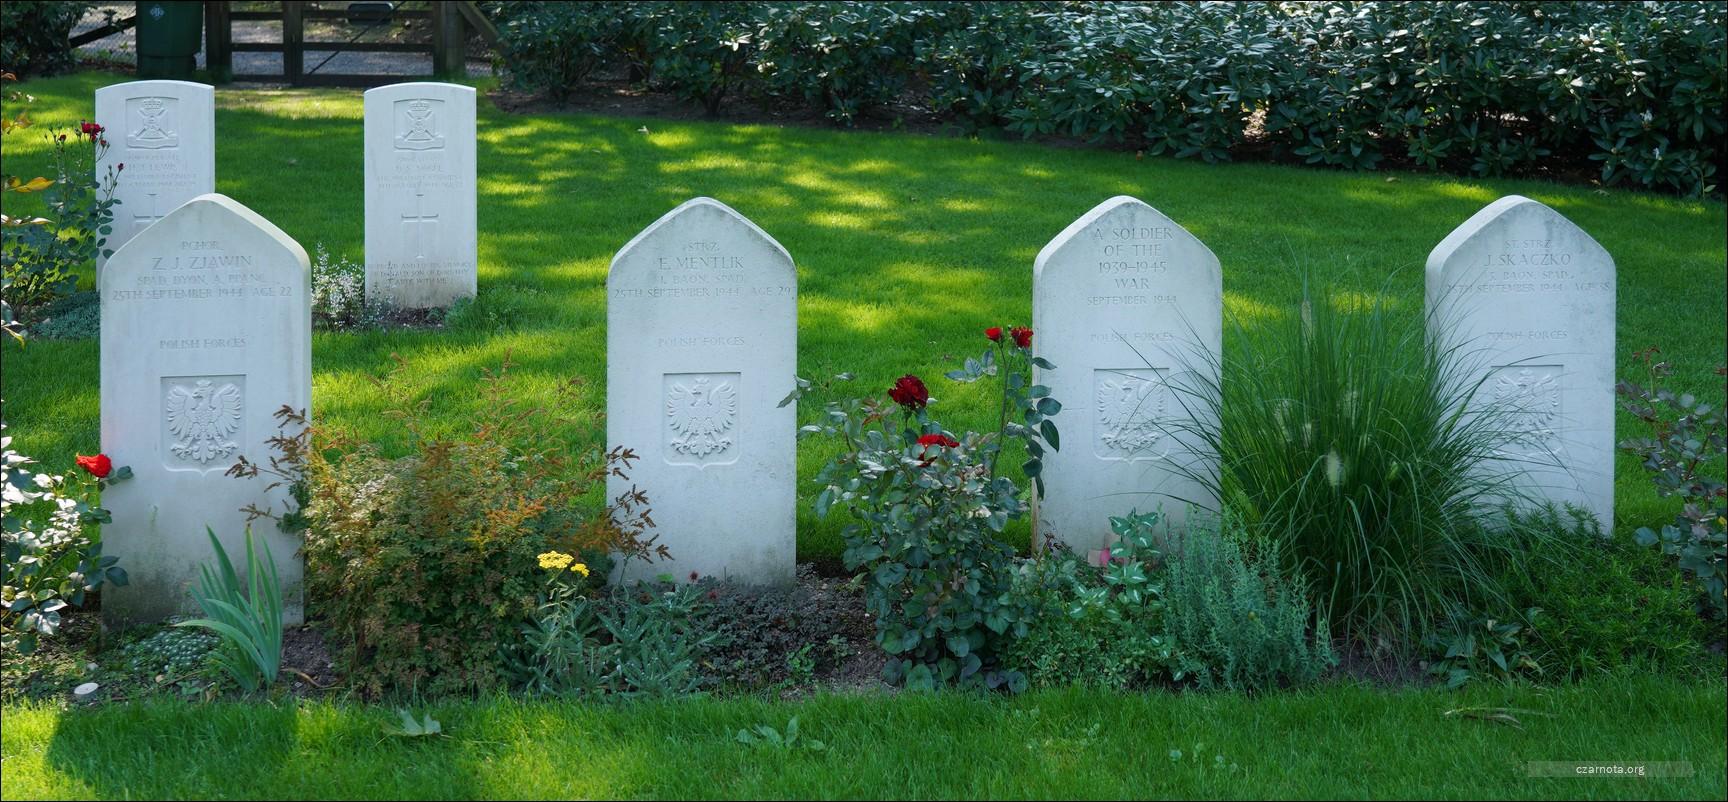 https://czarnota.org/_gallery/albums/userpics/10001/2019_08_26_144917_Netherlands_Arnhem_Oosterbeek_War_Cemetery_Airborne_War_Cemetery_Holandia_Cmentarz_Wojenny_w_Arnhem-Oosterbeek.jpg